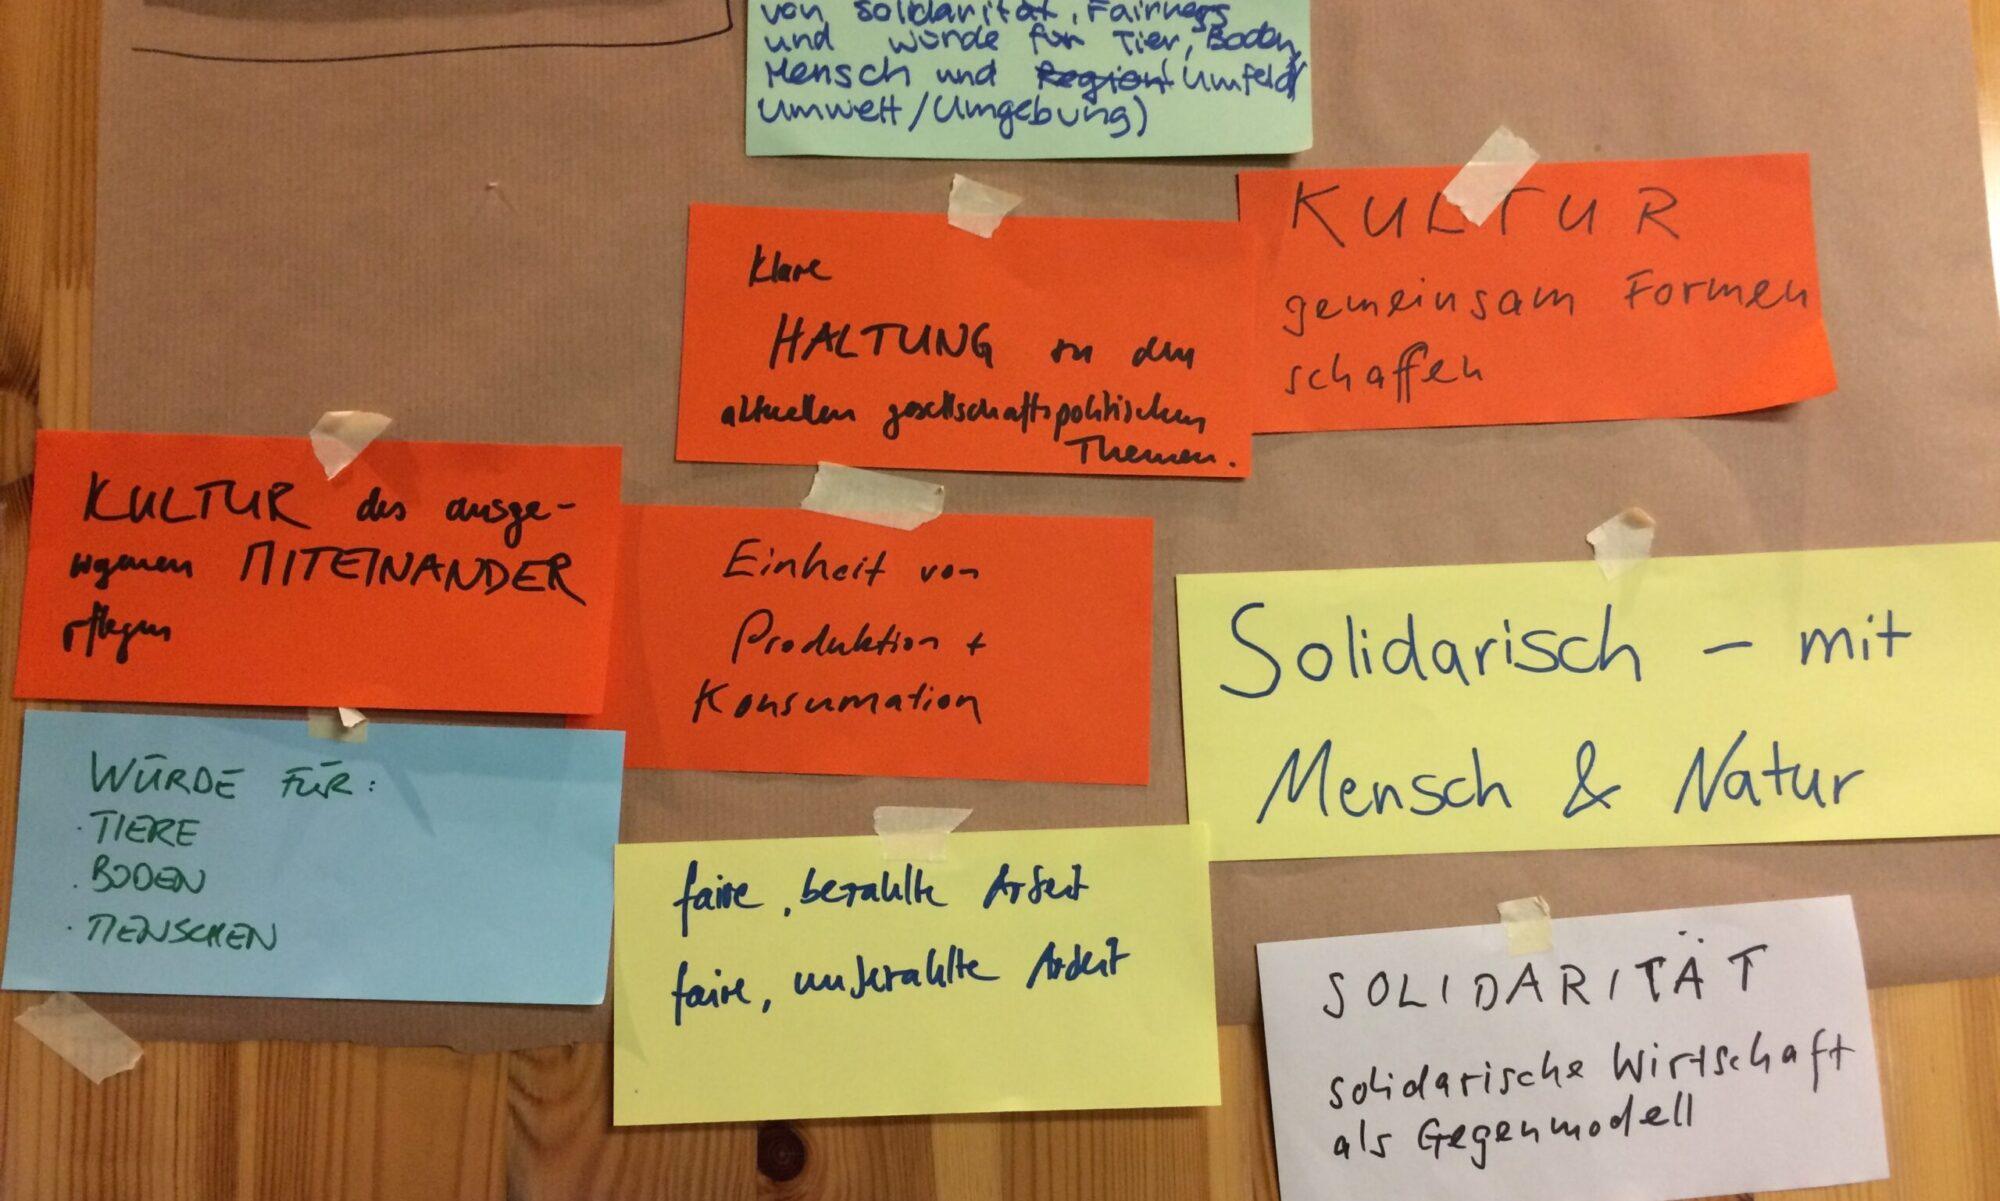 ortoloco Blog - Die Hofkooperative im Fondli